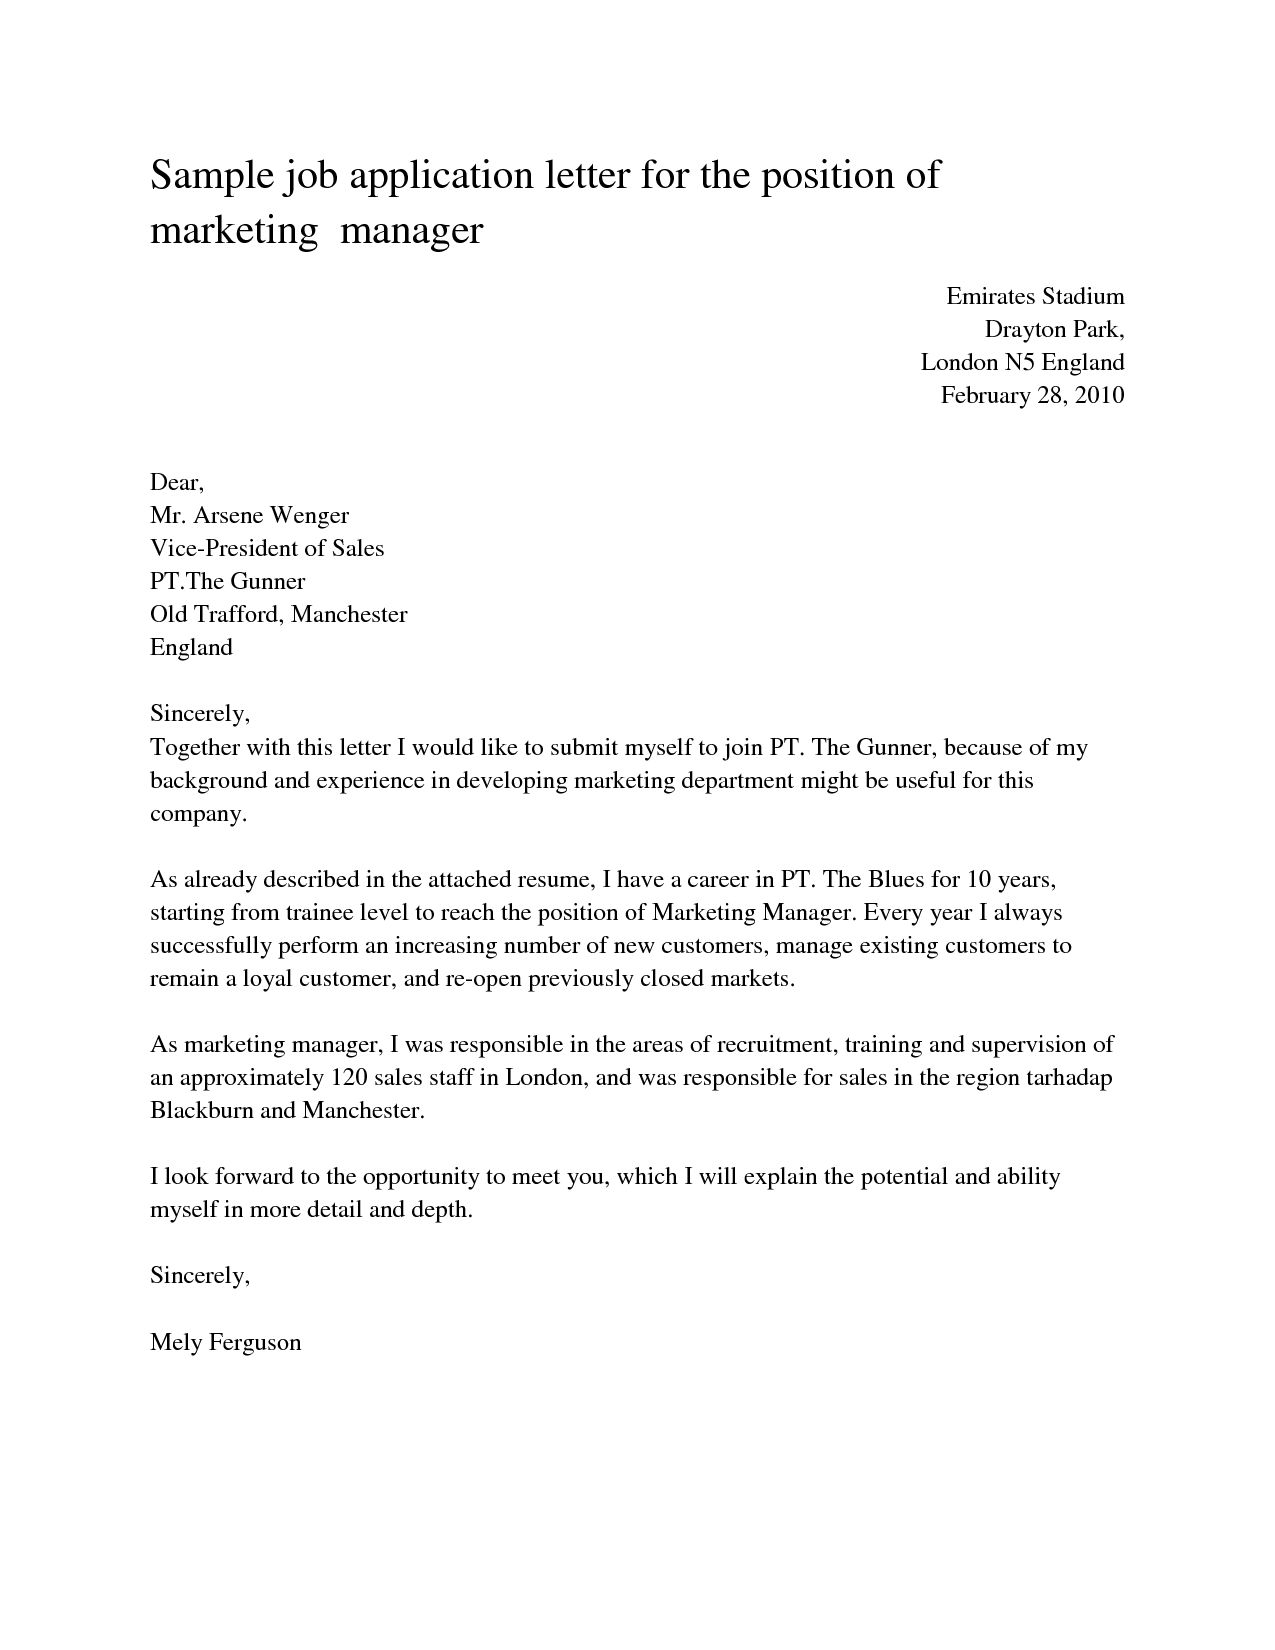 26 Cover Letter For Applying Job Application Simple Fiustk